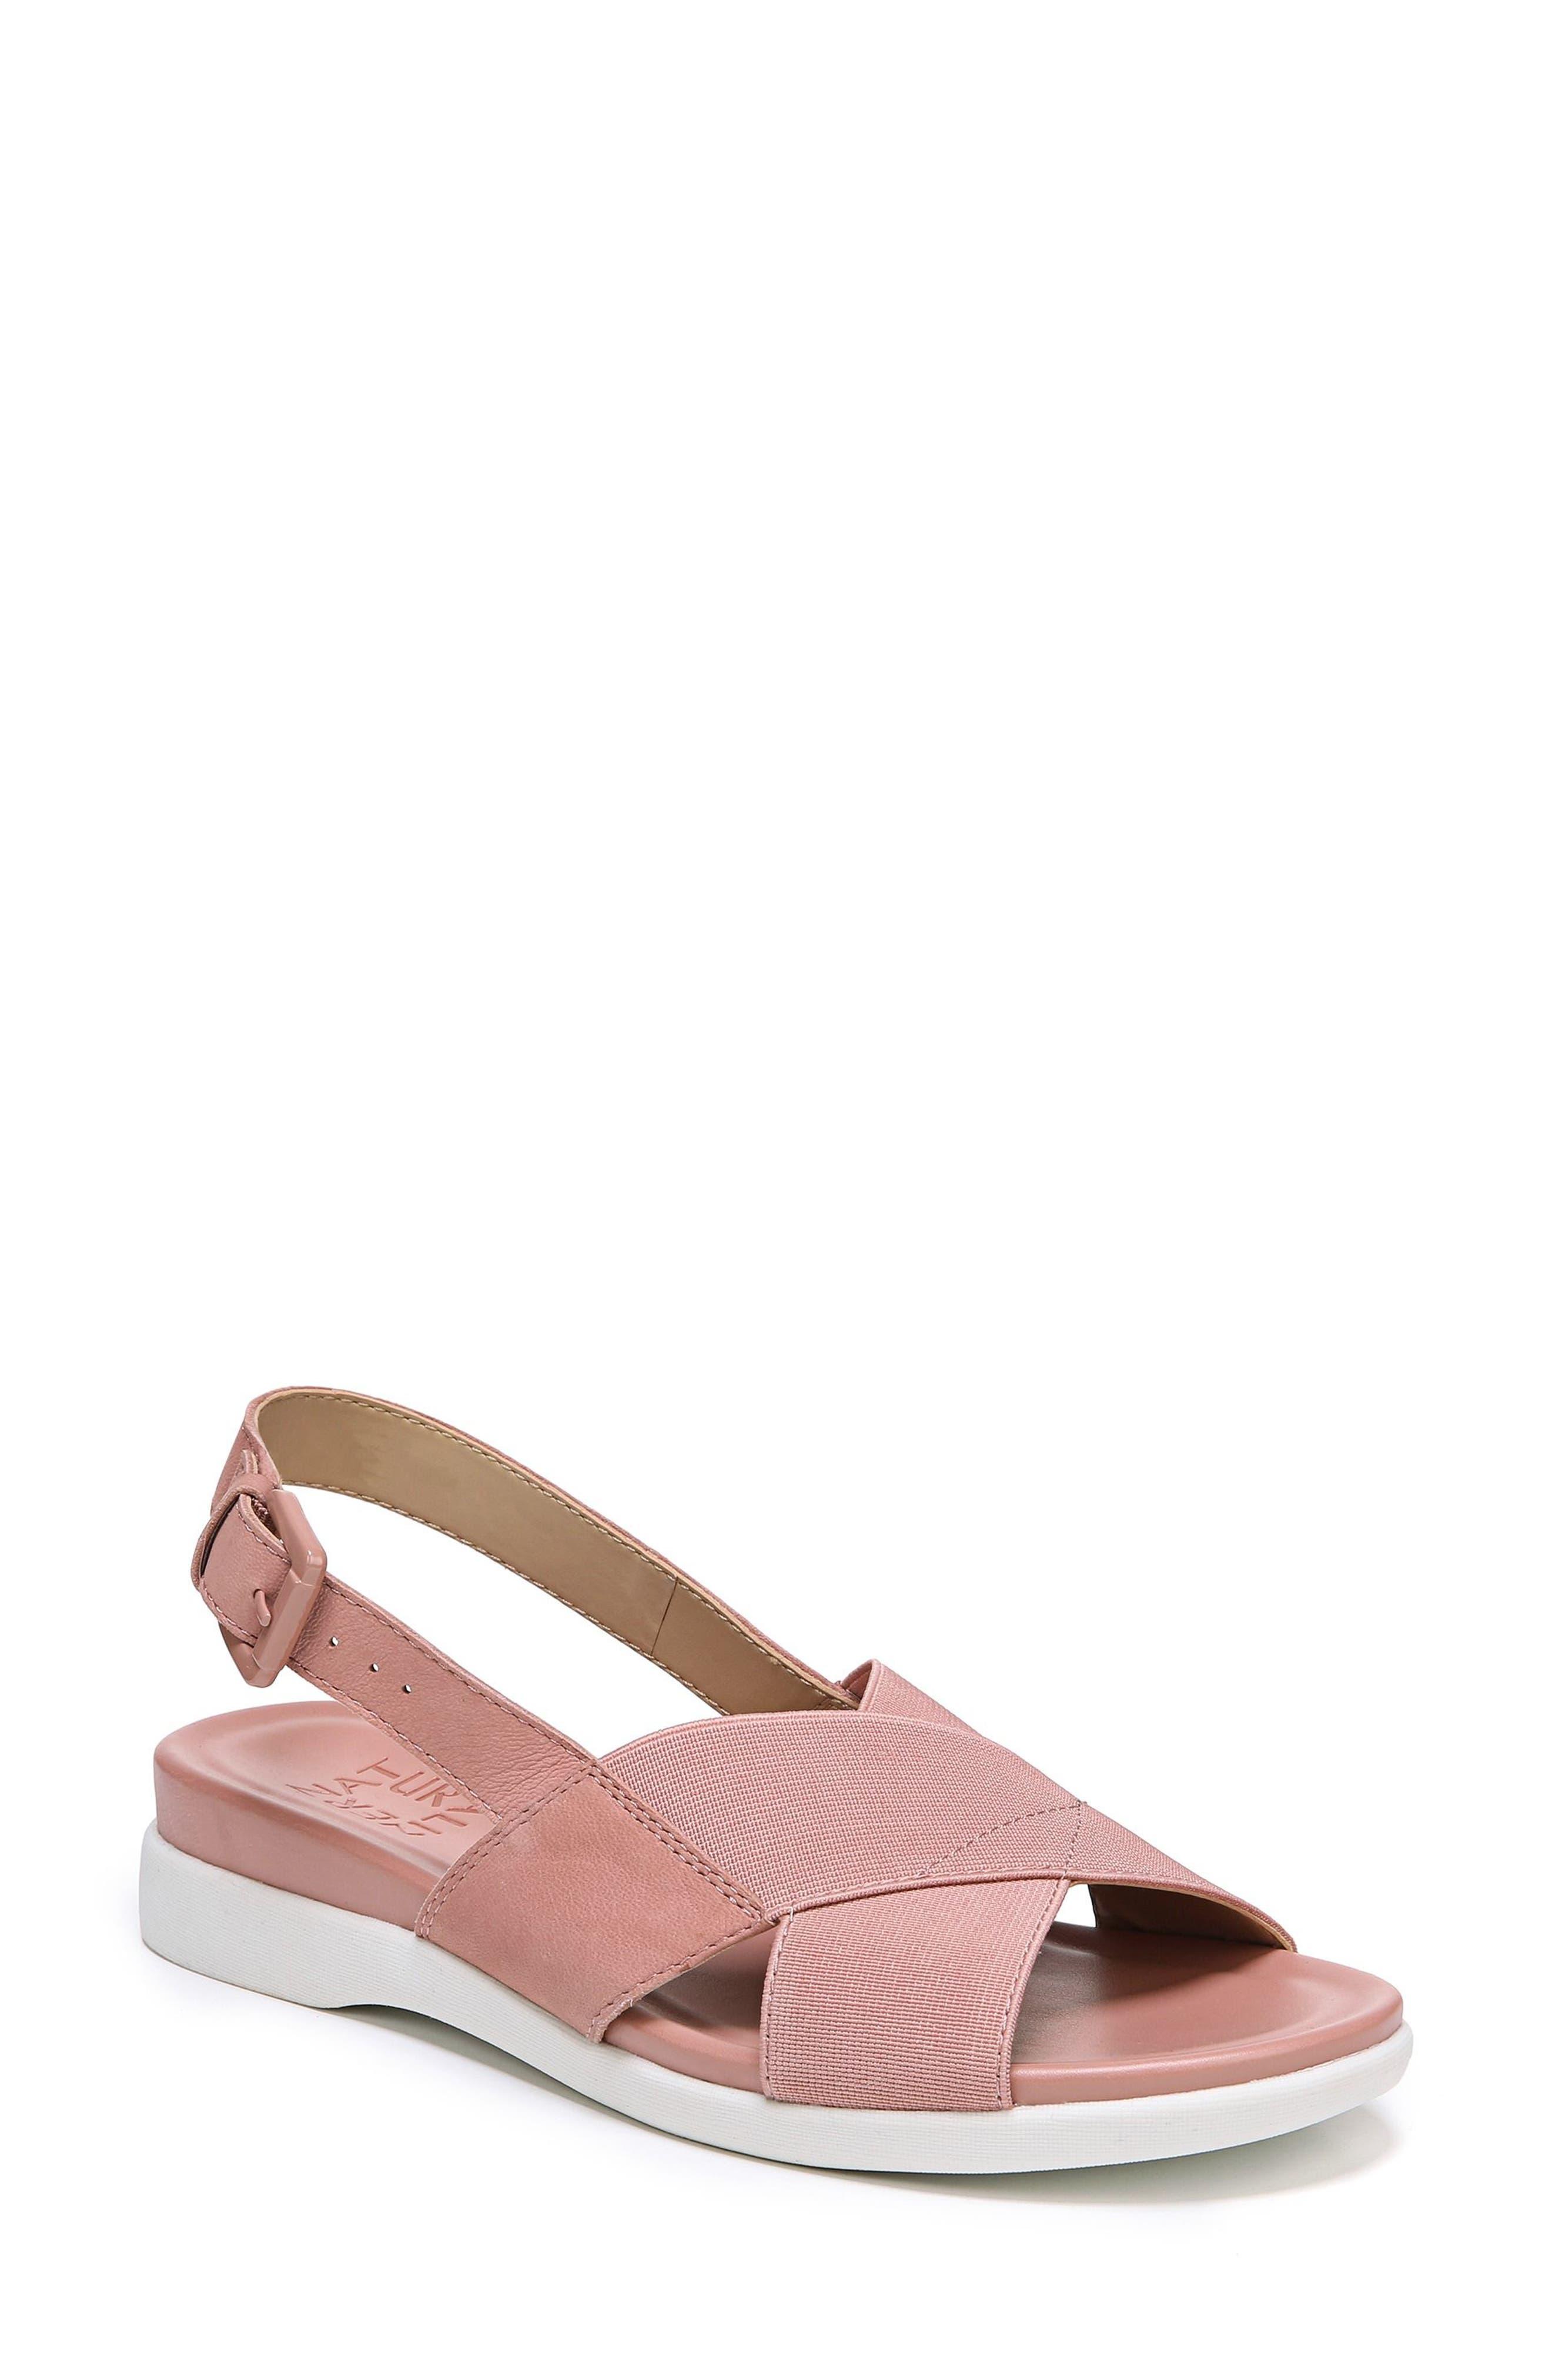 Eliza Wedge Sandal,                         Main,                         color, Pink Nubuck Leather